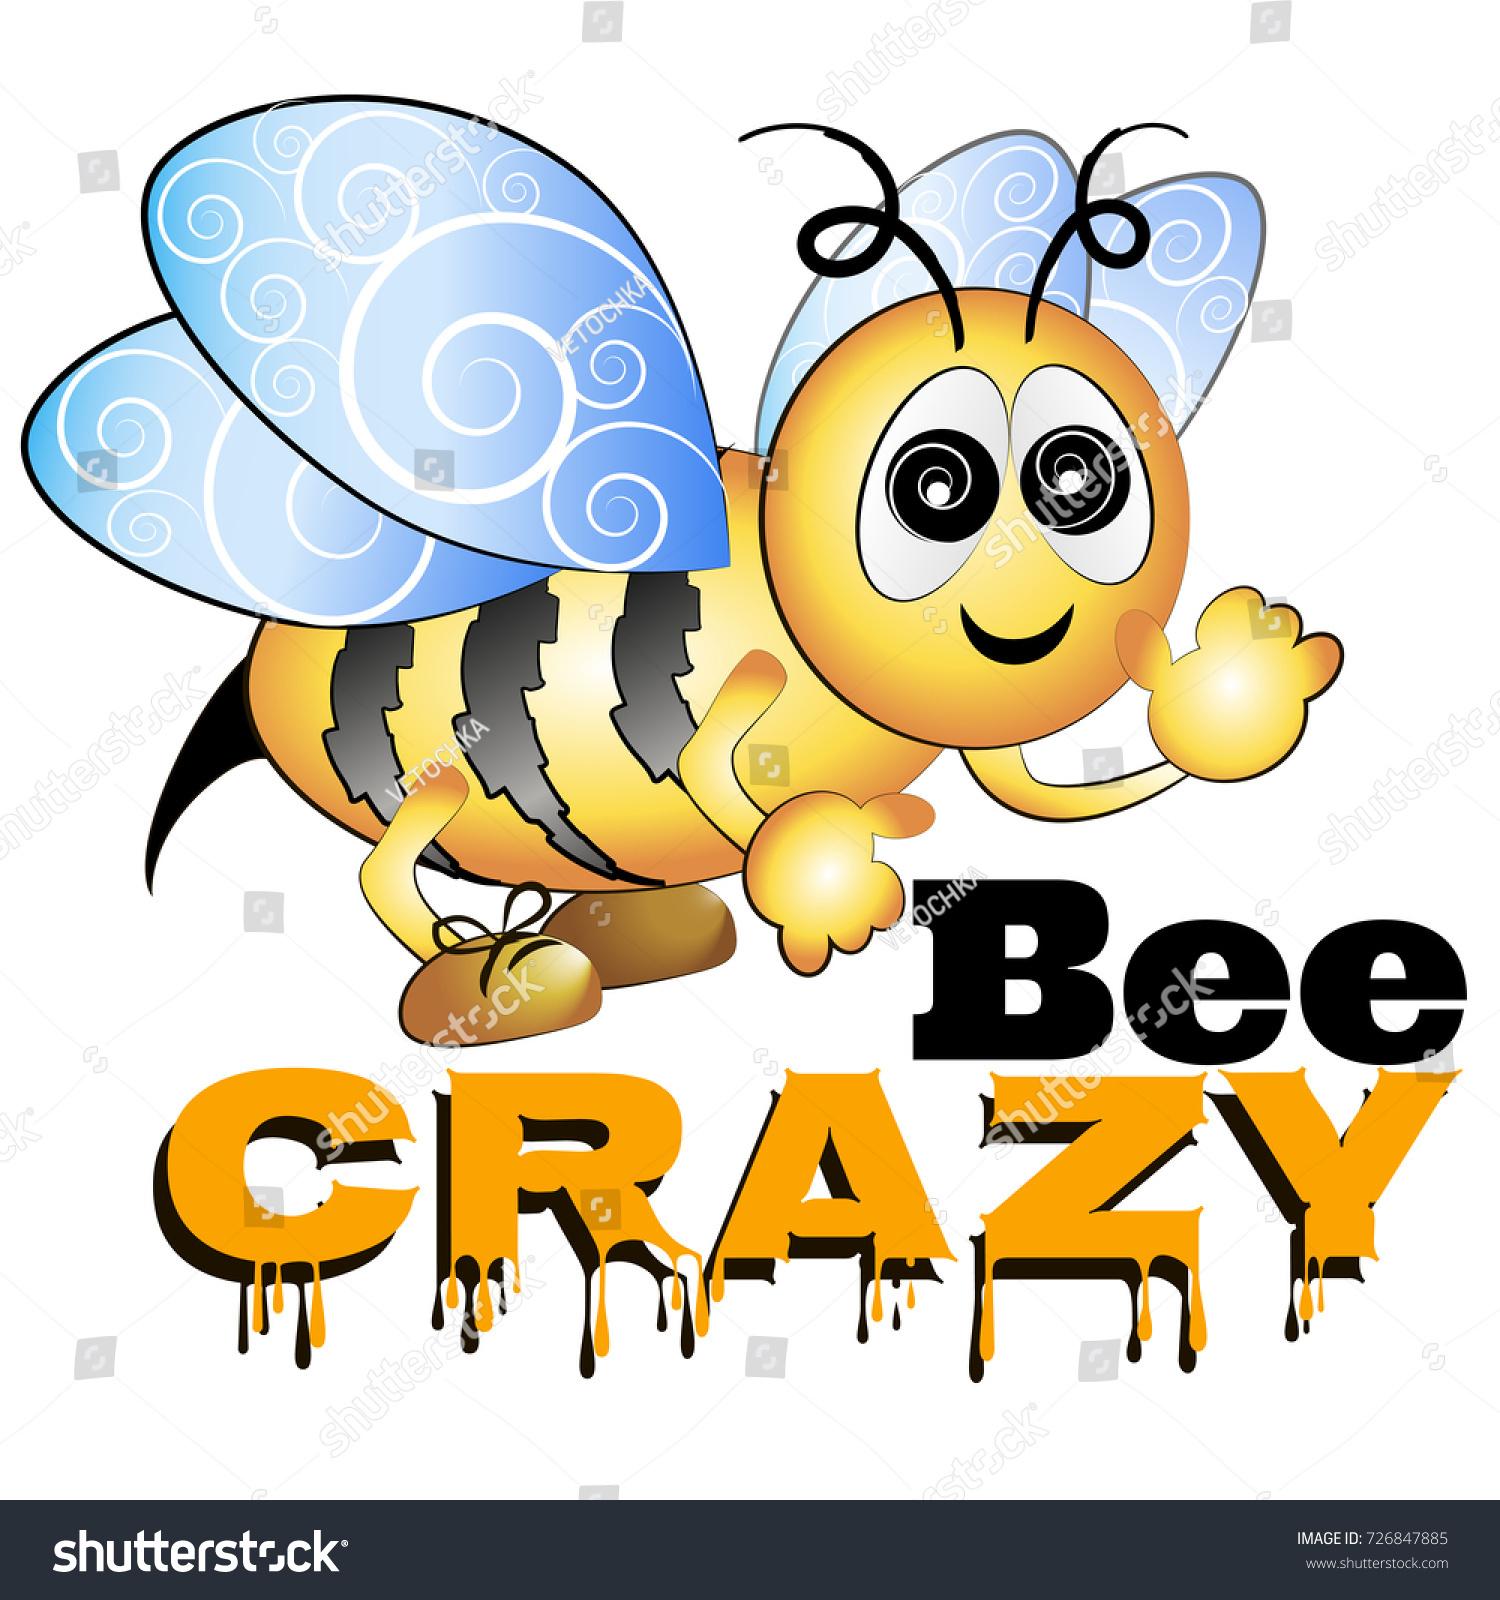 Crazy bee cartoon illustration text stock vector 726847885 crazy bee cartoon illustration with text biocorpaavc